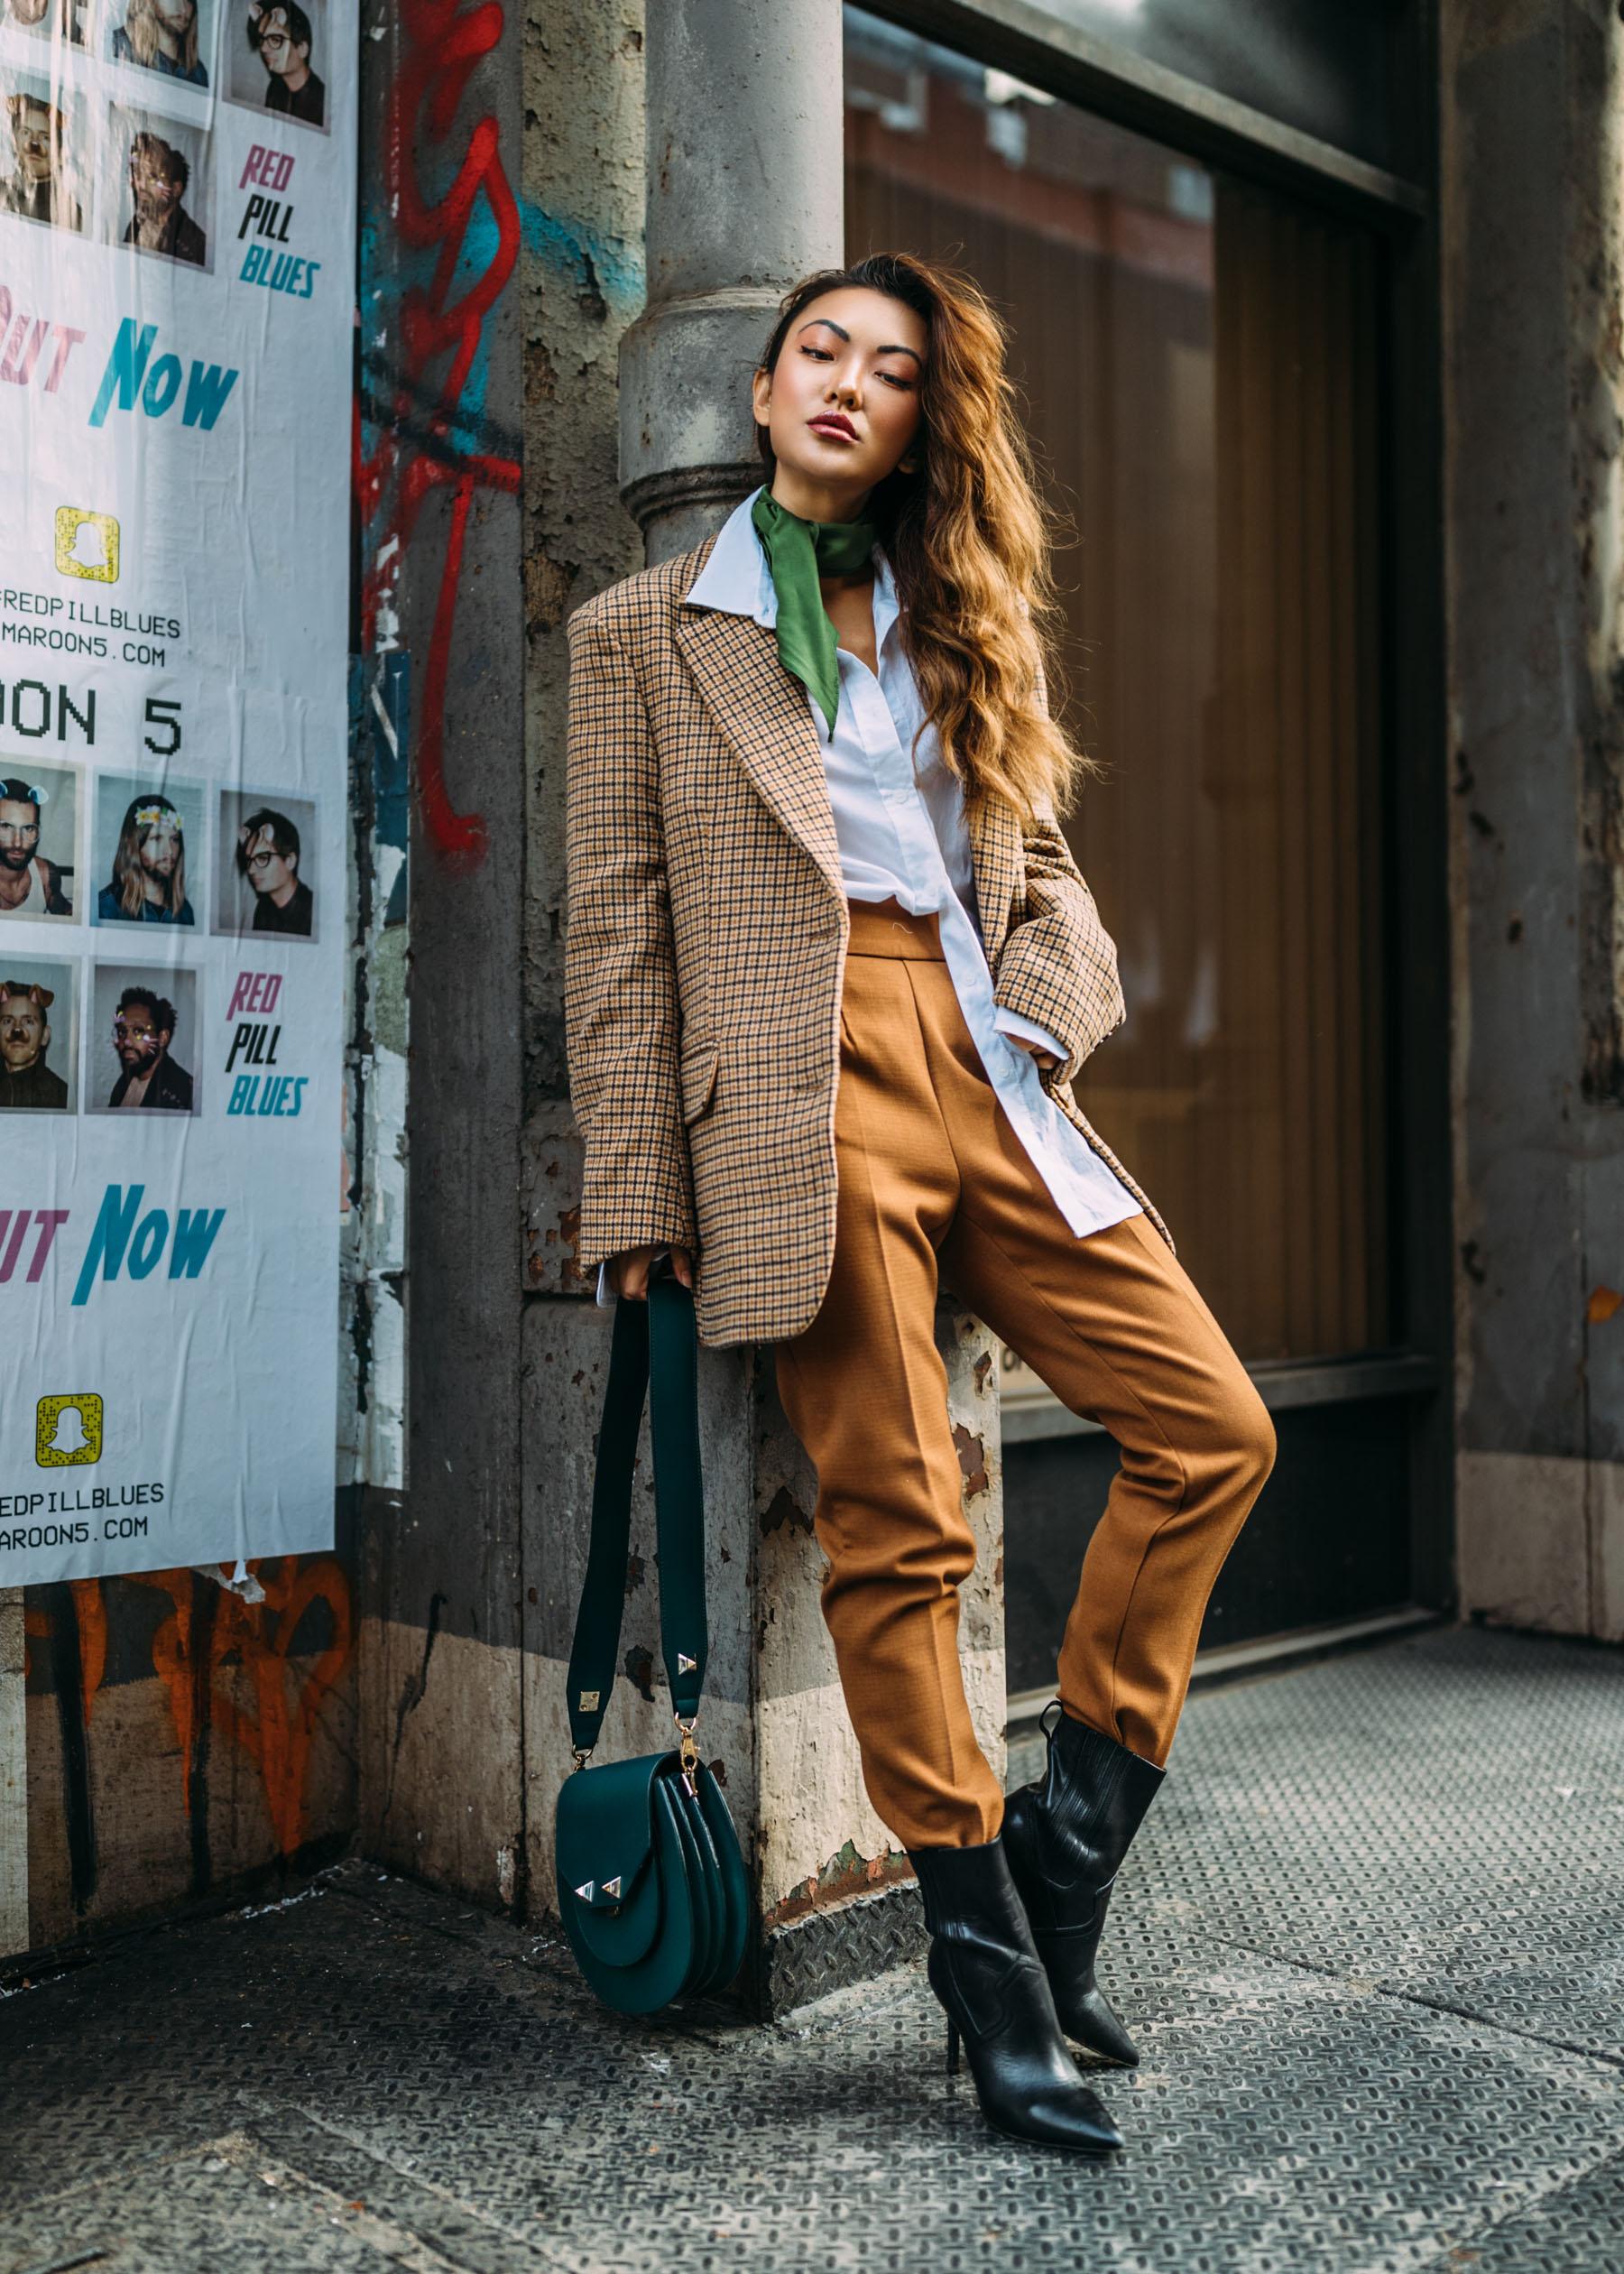 Winter Instagram Outfits - Plaid Blazer Outfit // Notjessfashion.com